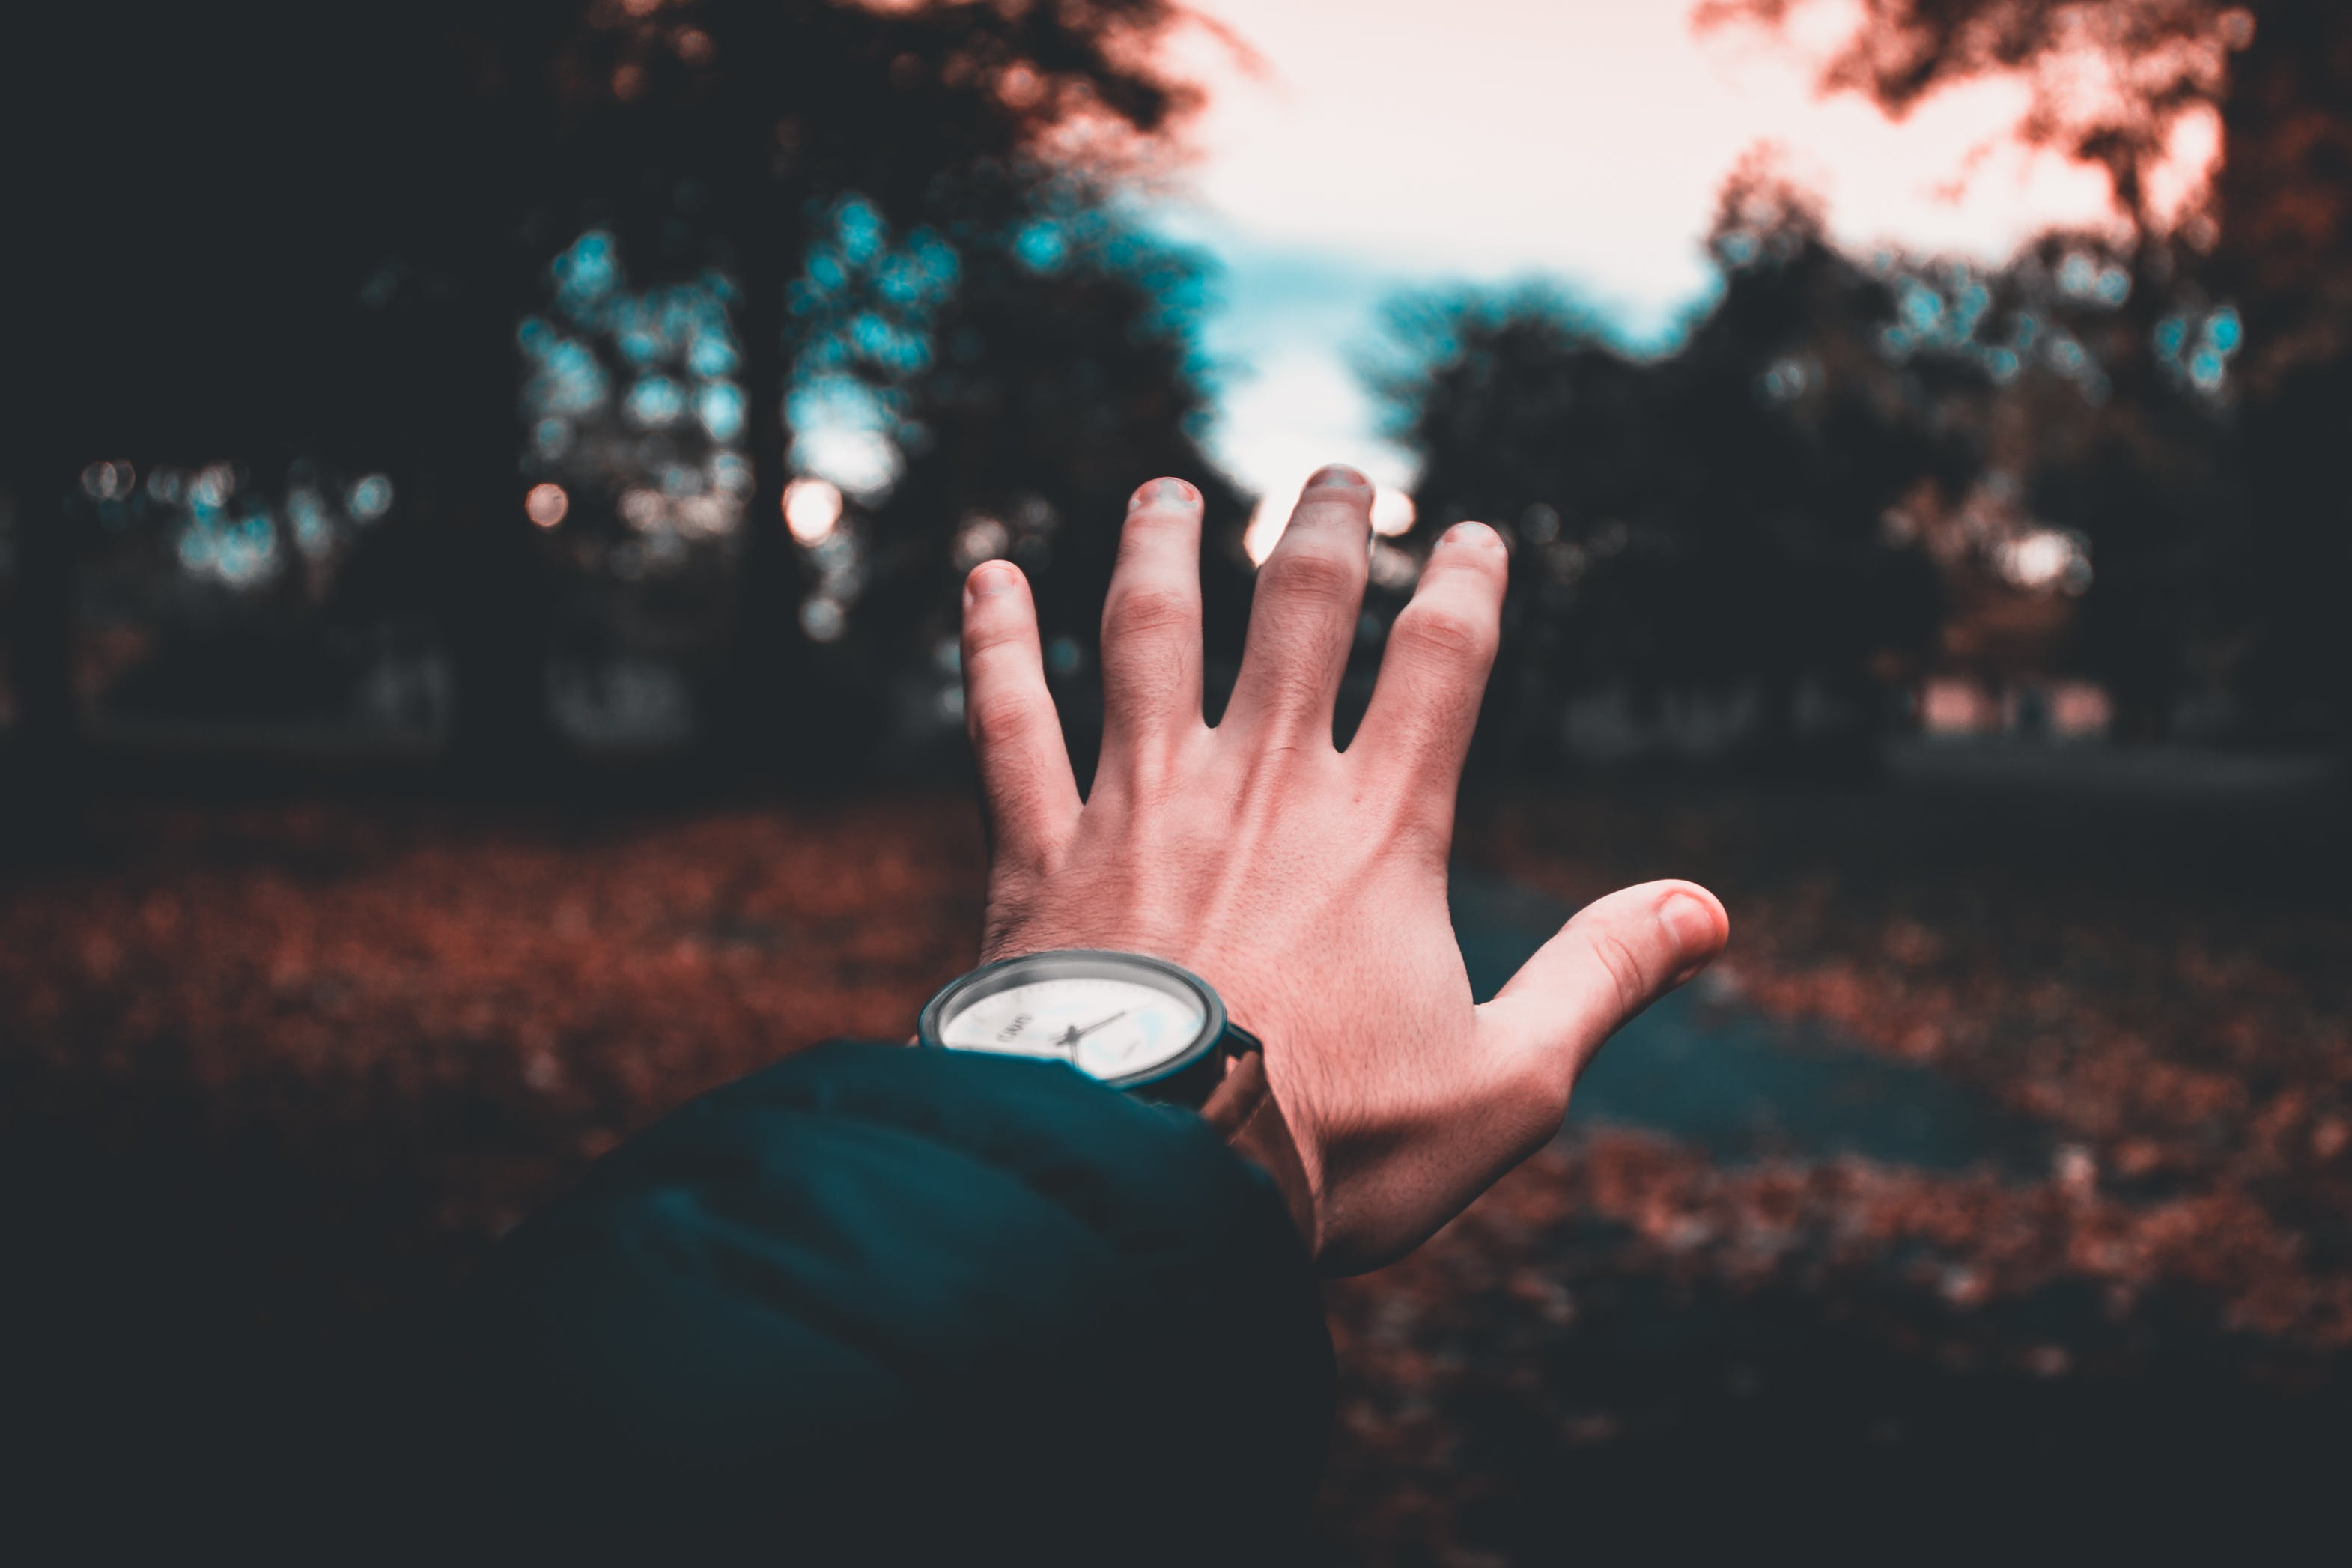 Person Wearing Round Analog Watch